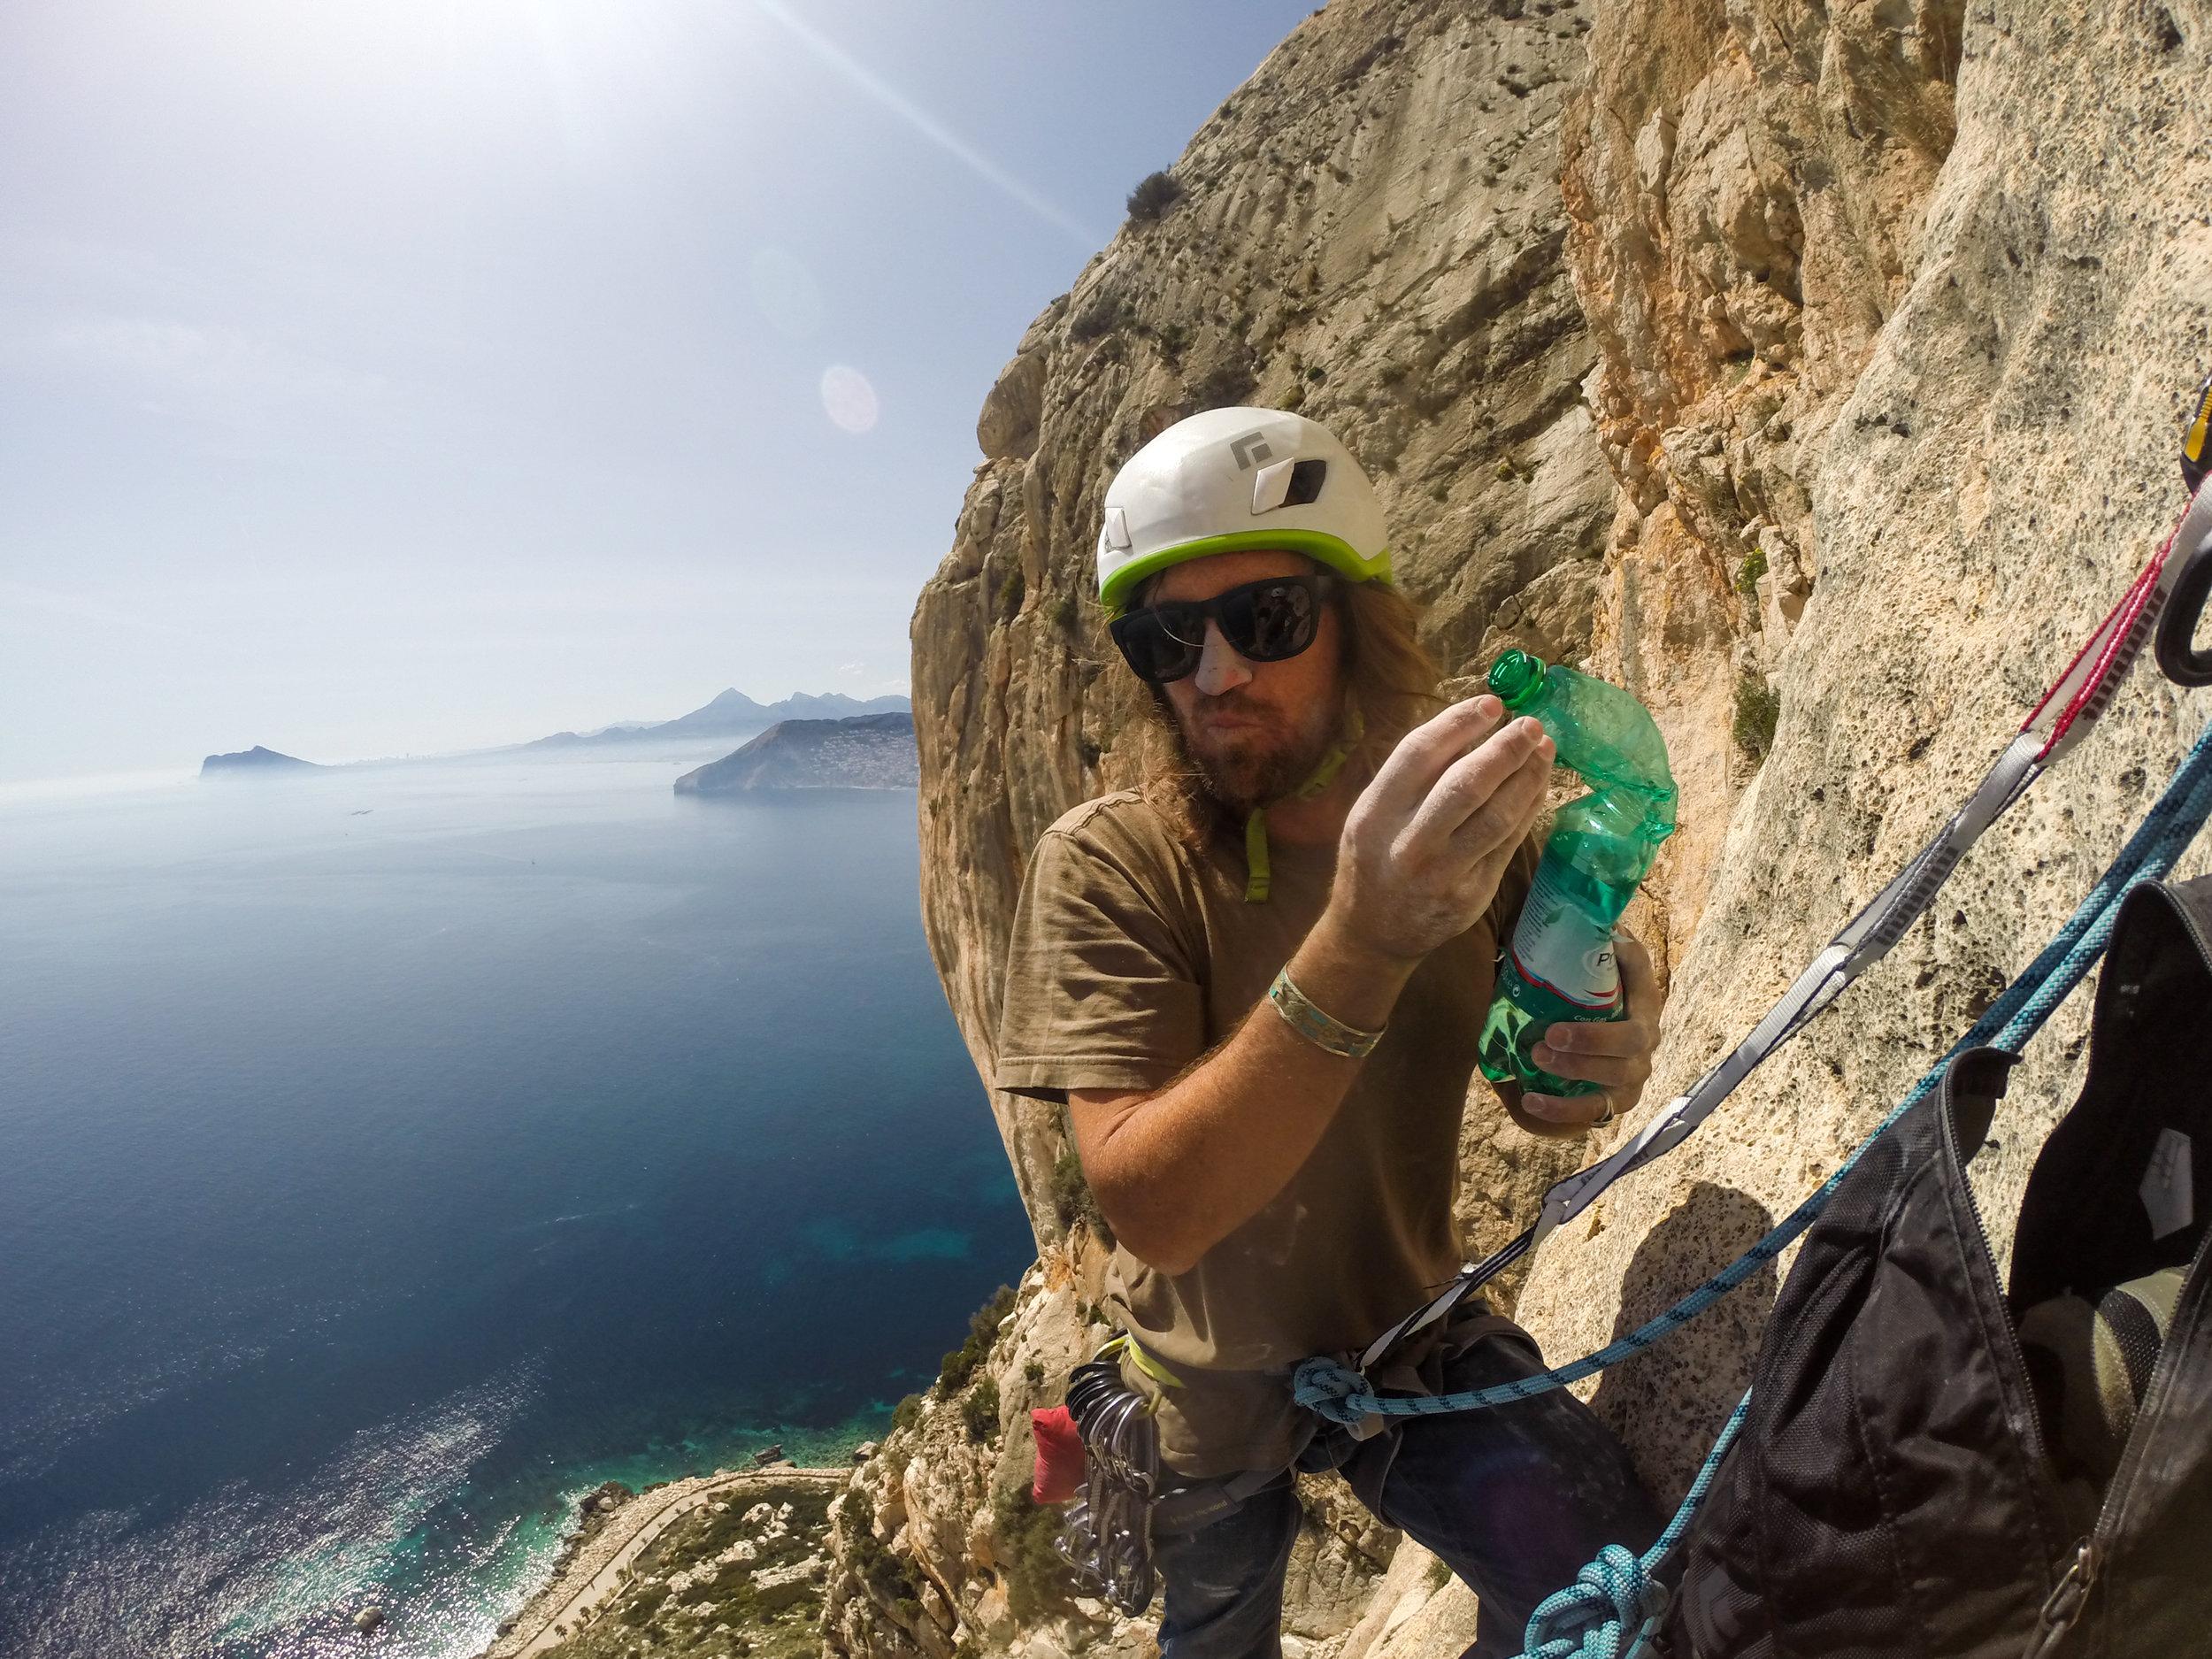 climbinginspain-13.jpg